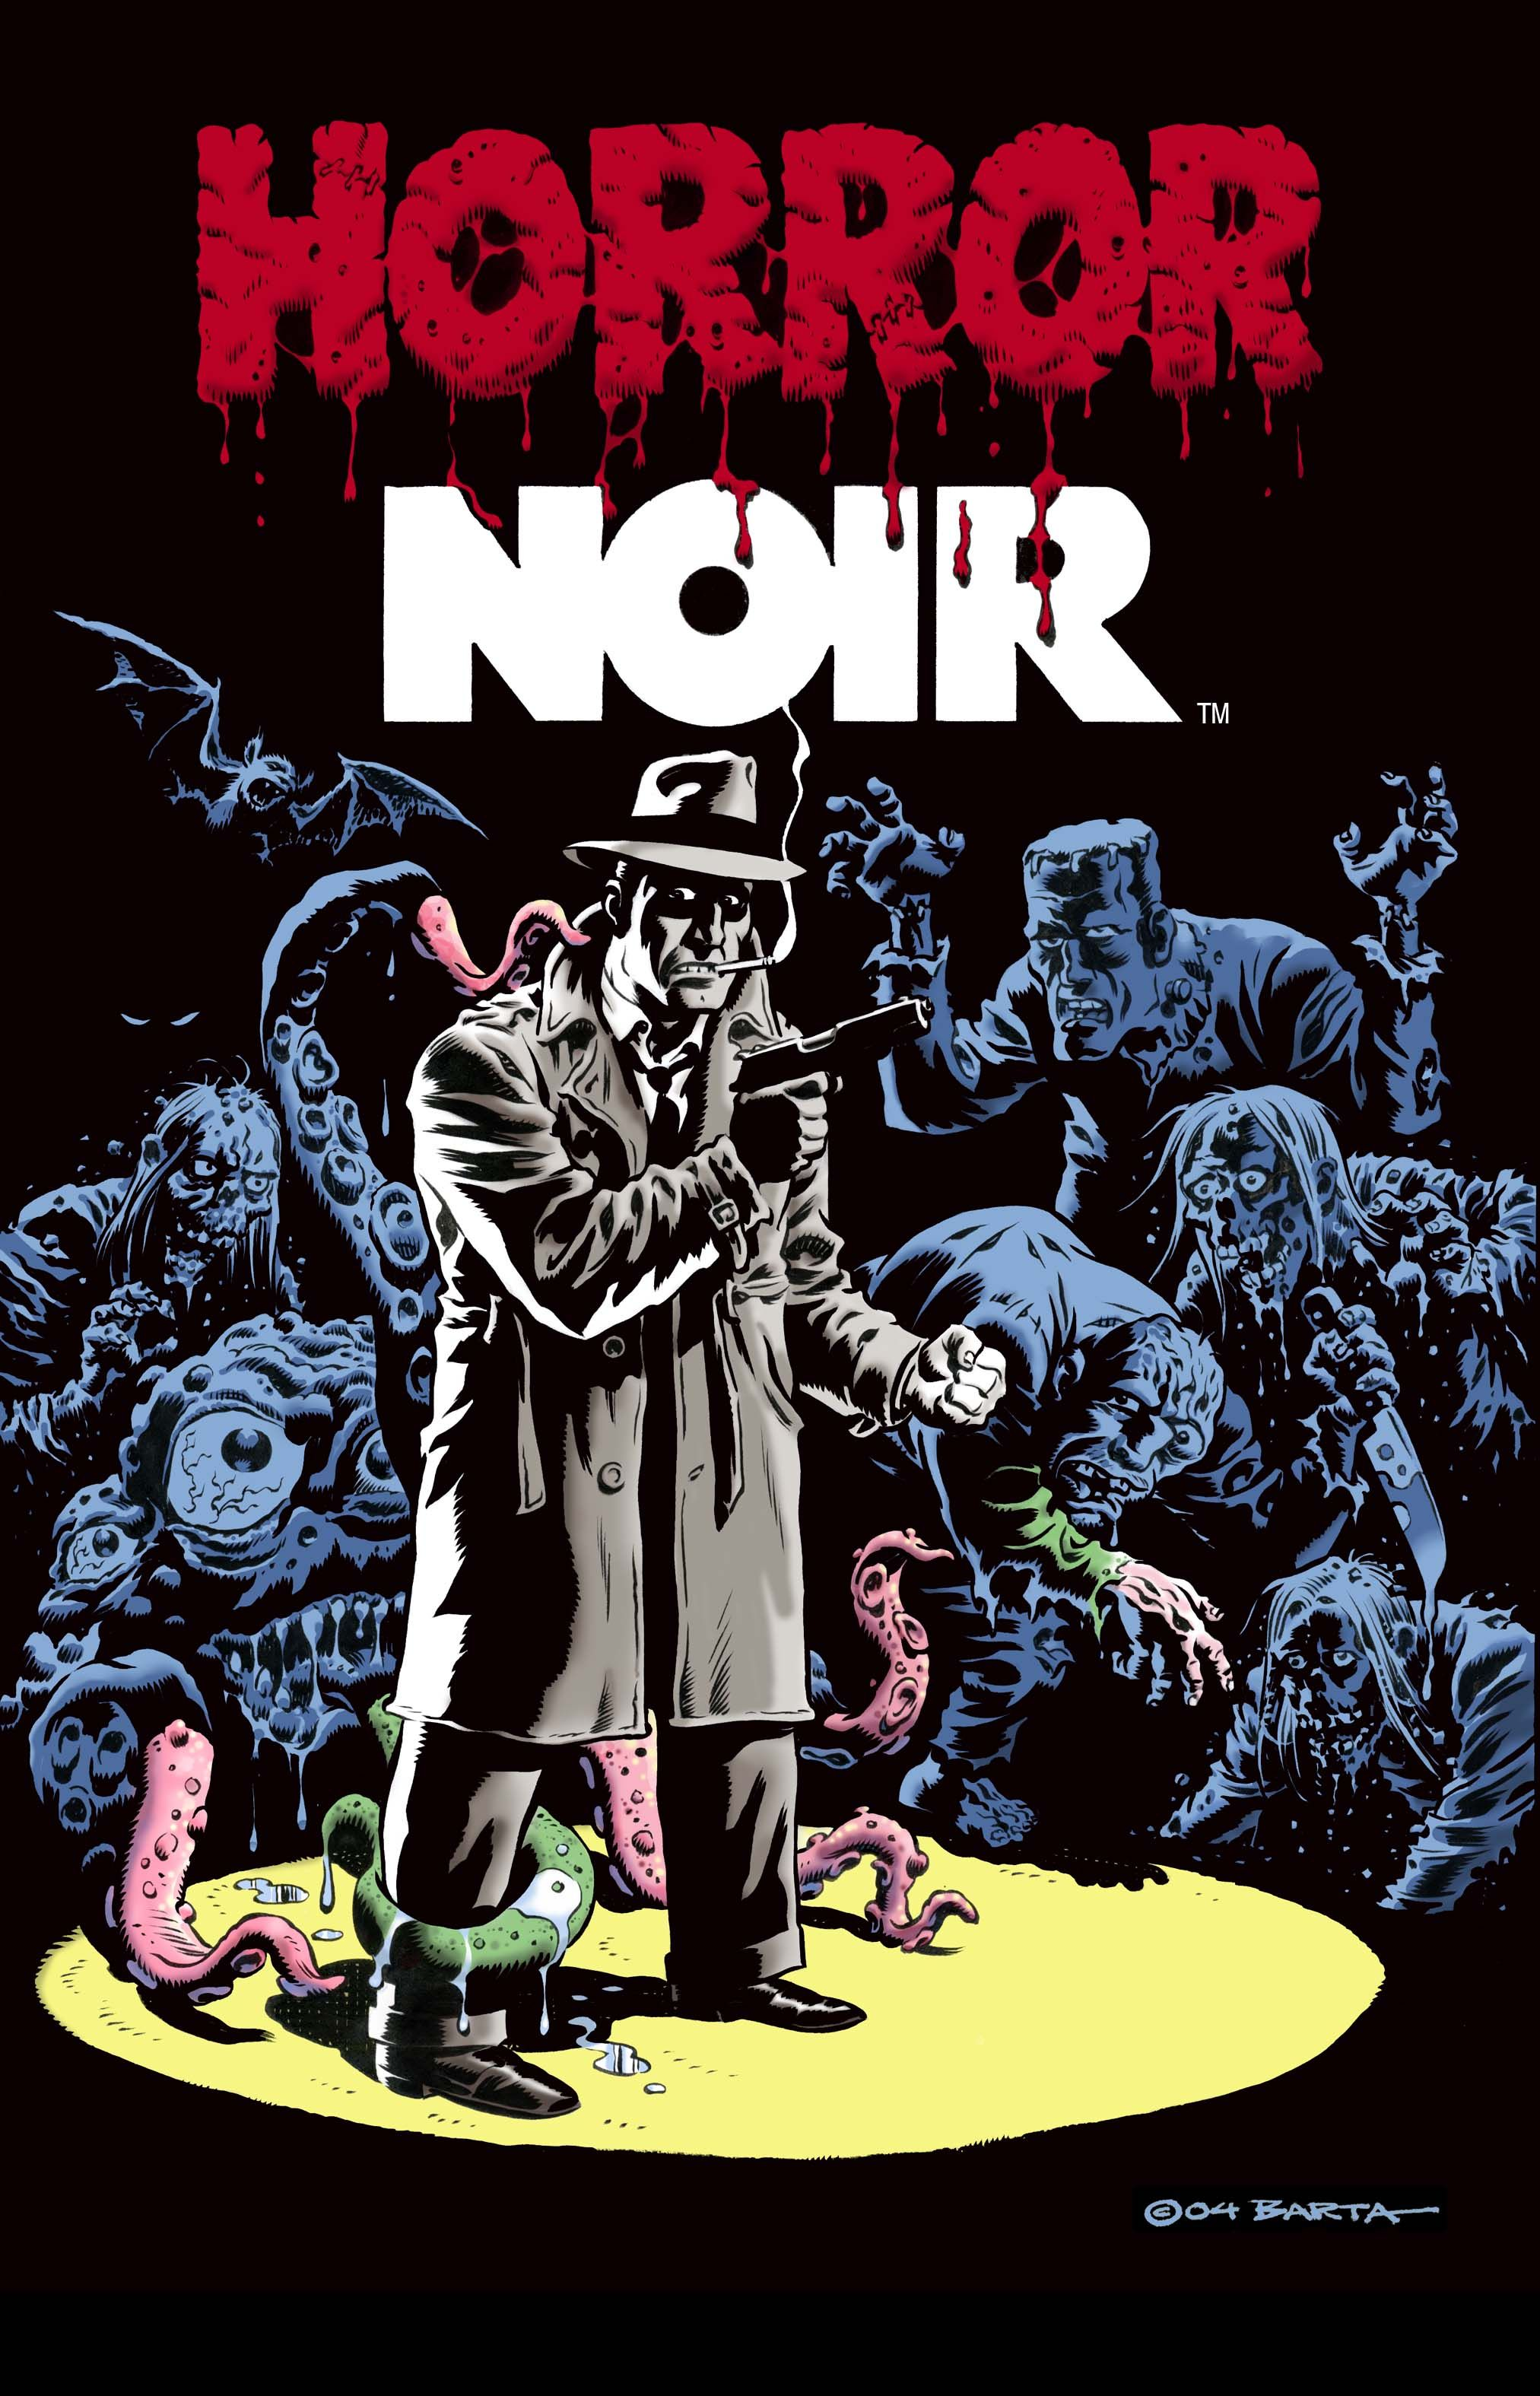 HorrorNoir-HilaryBarta